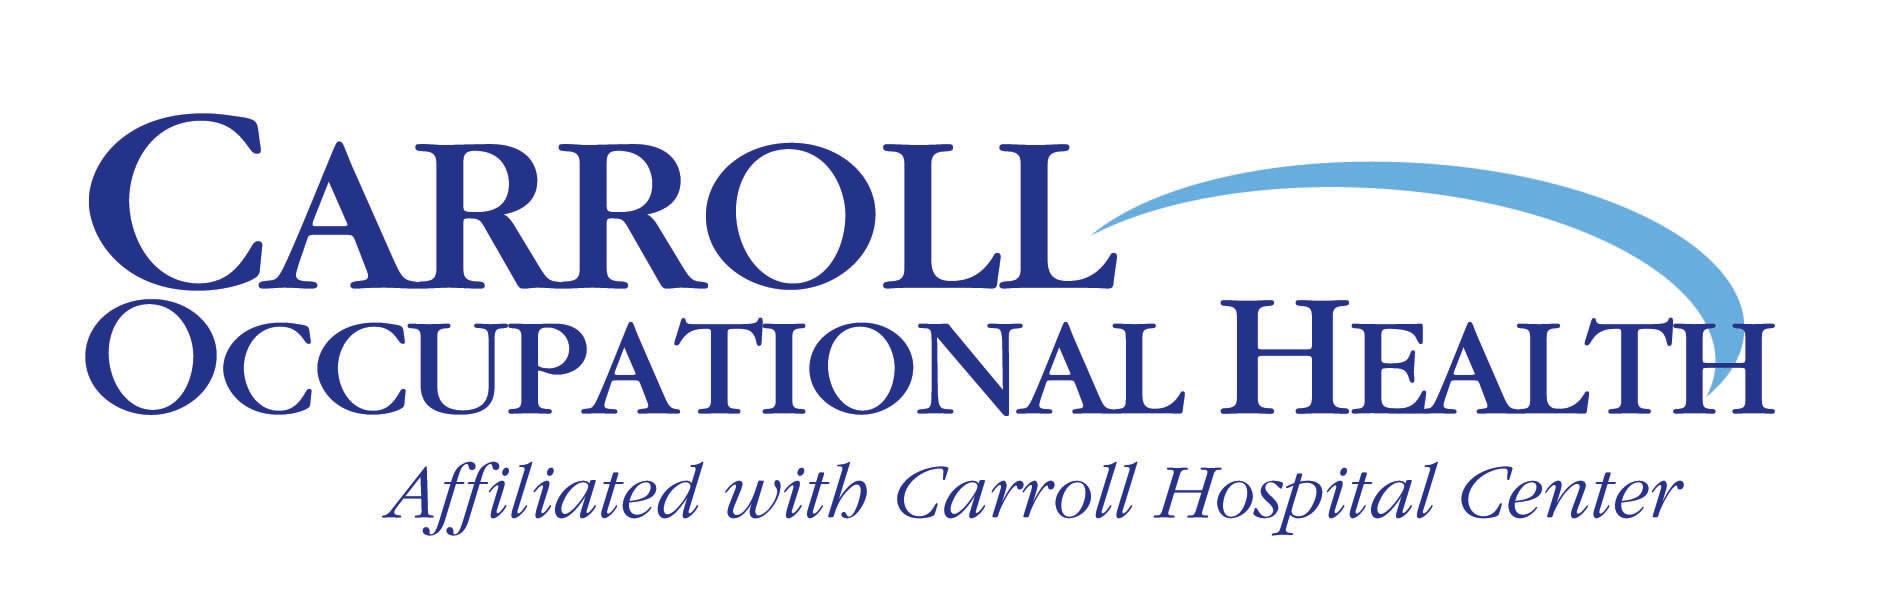 Carroll Occupational Health